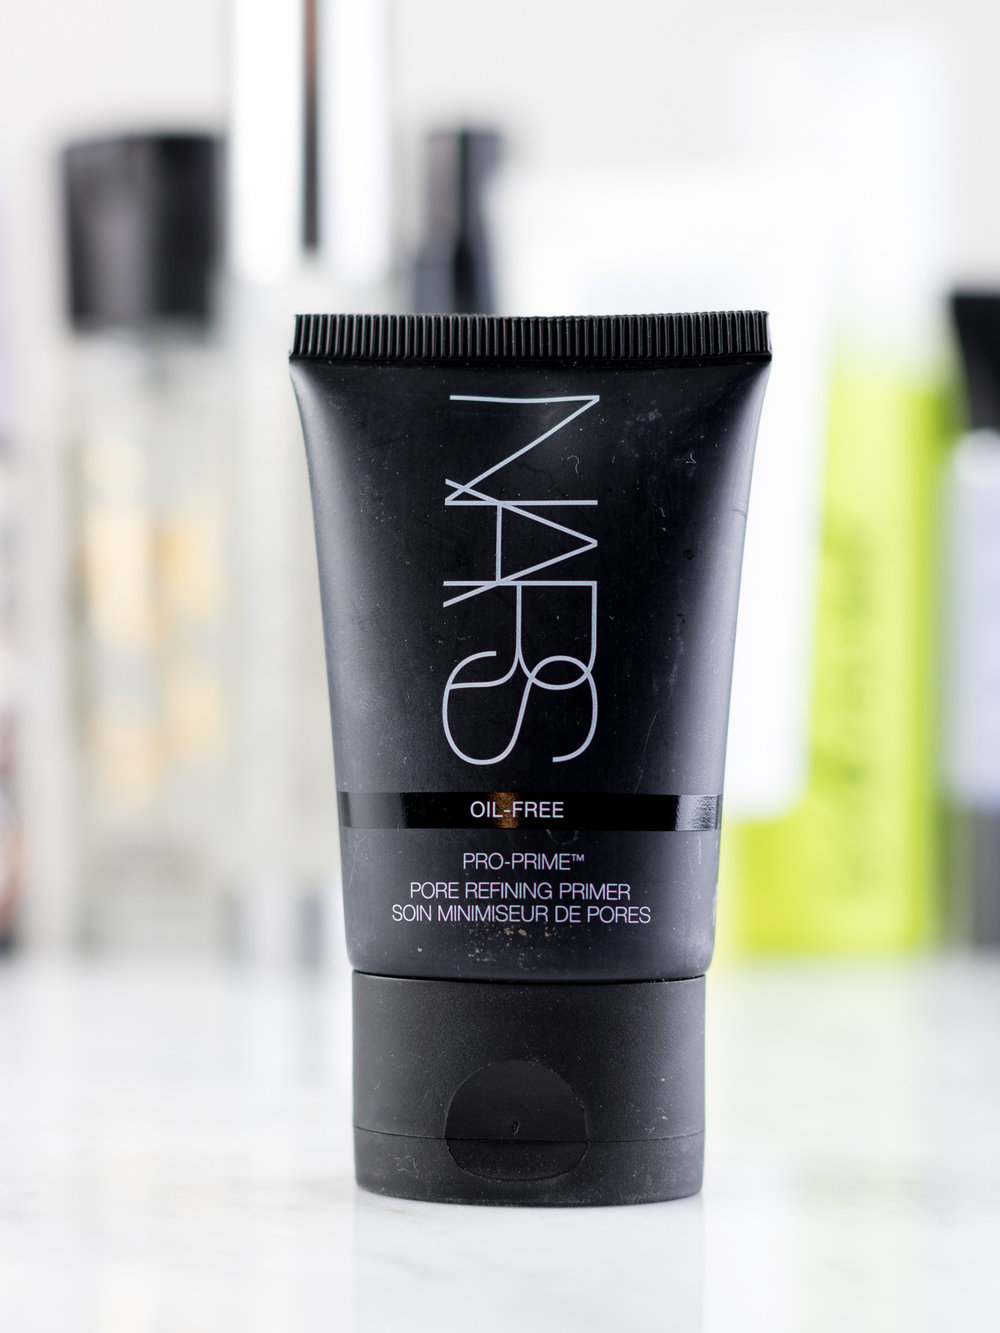 NARS Pro-Primer Pore Refining Primer